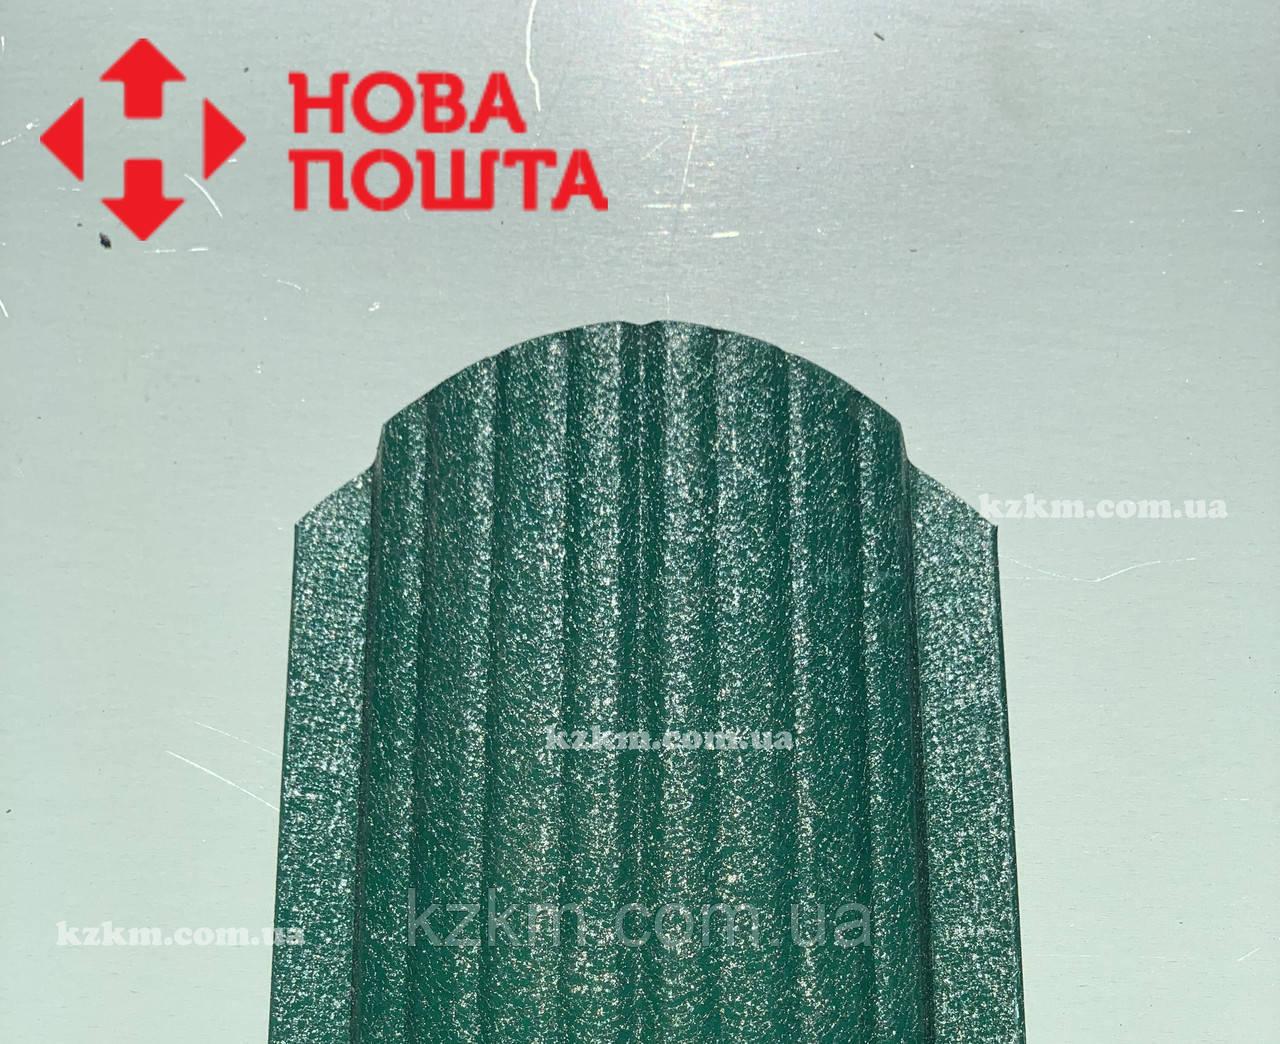 Штакетник матовый зеленый RAL 6005, штахет, евроштакет , забор из штакета, металлический зеленого цвета